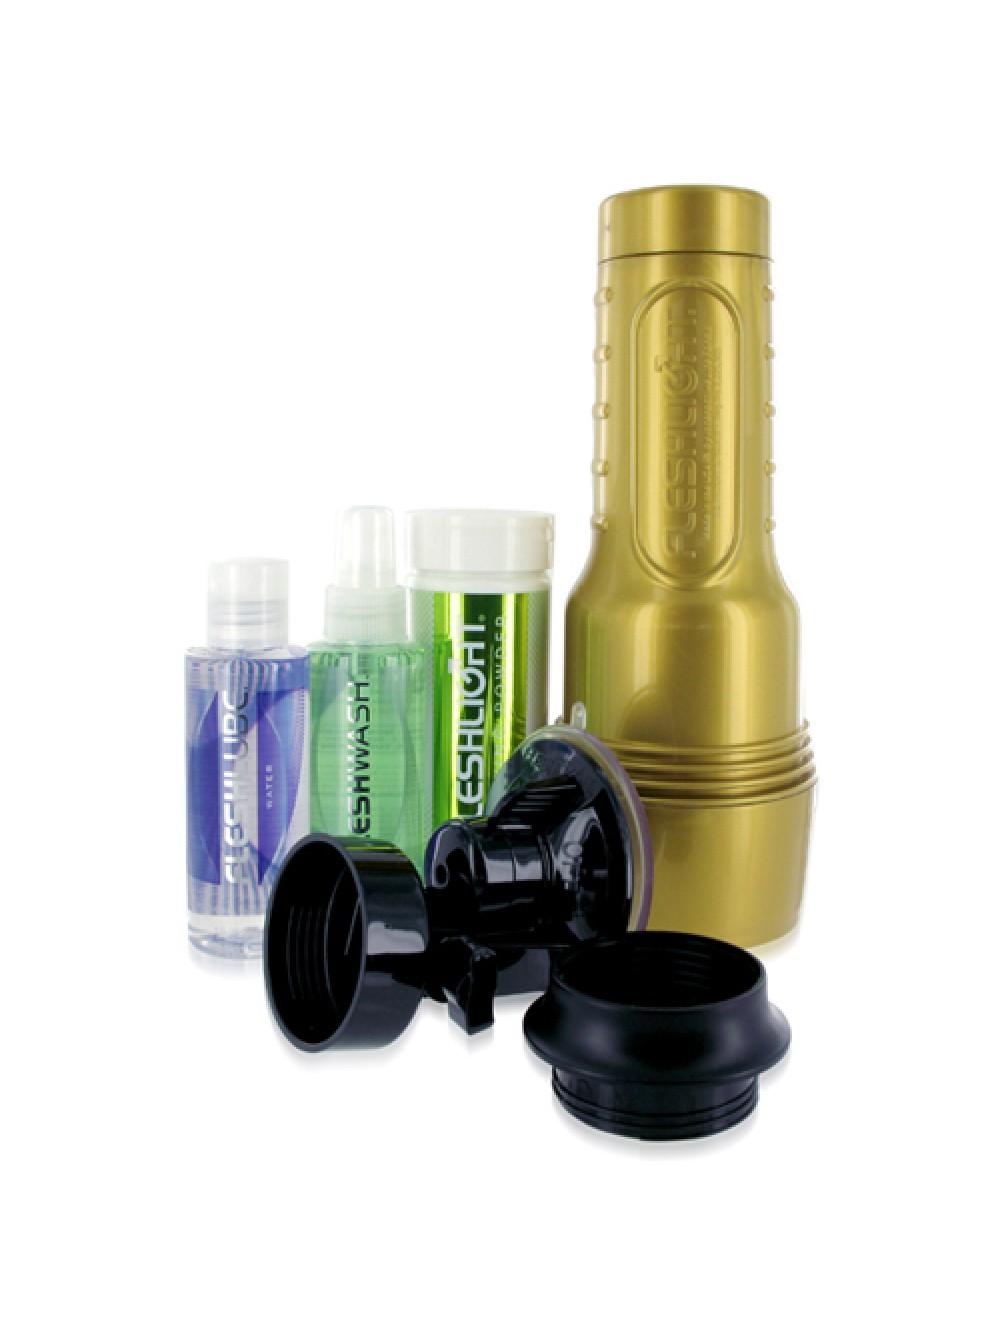 Fleshlight Stamina Training Unit STU Value Pack 810476019532